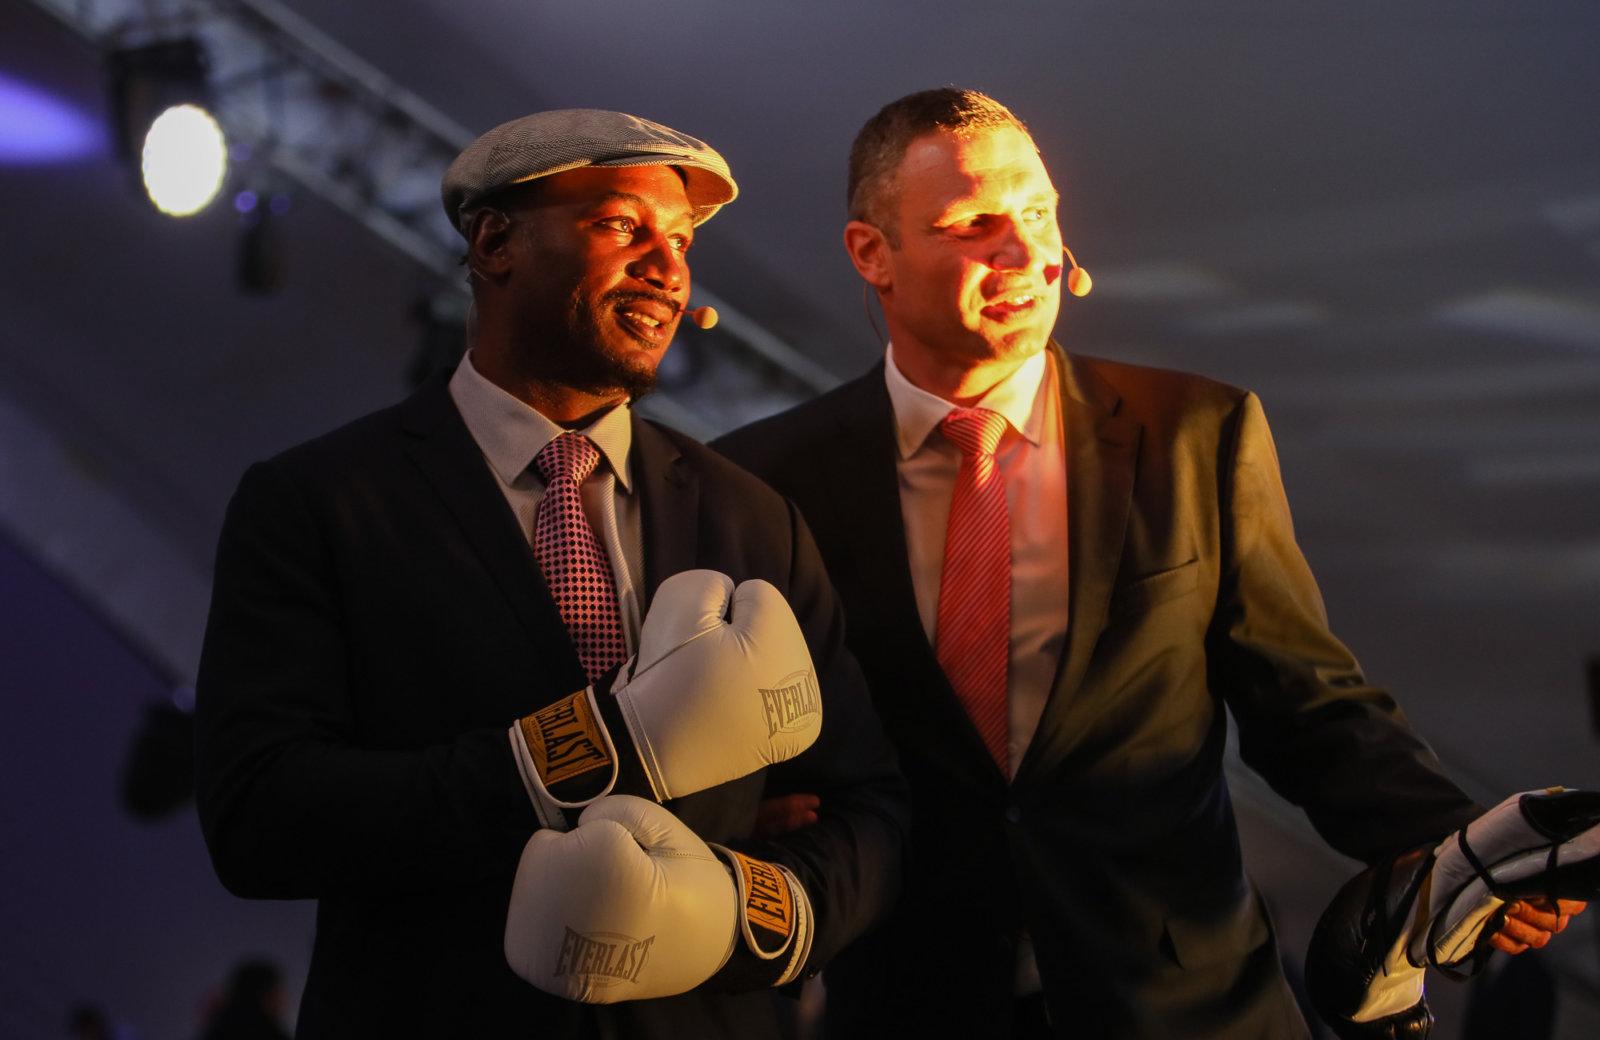 Ukrinform: Vitali Klitschko, Lennox Lewis meet in boxing